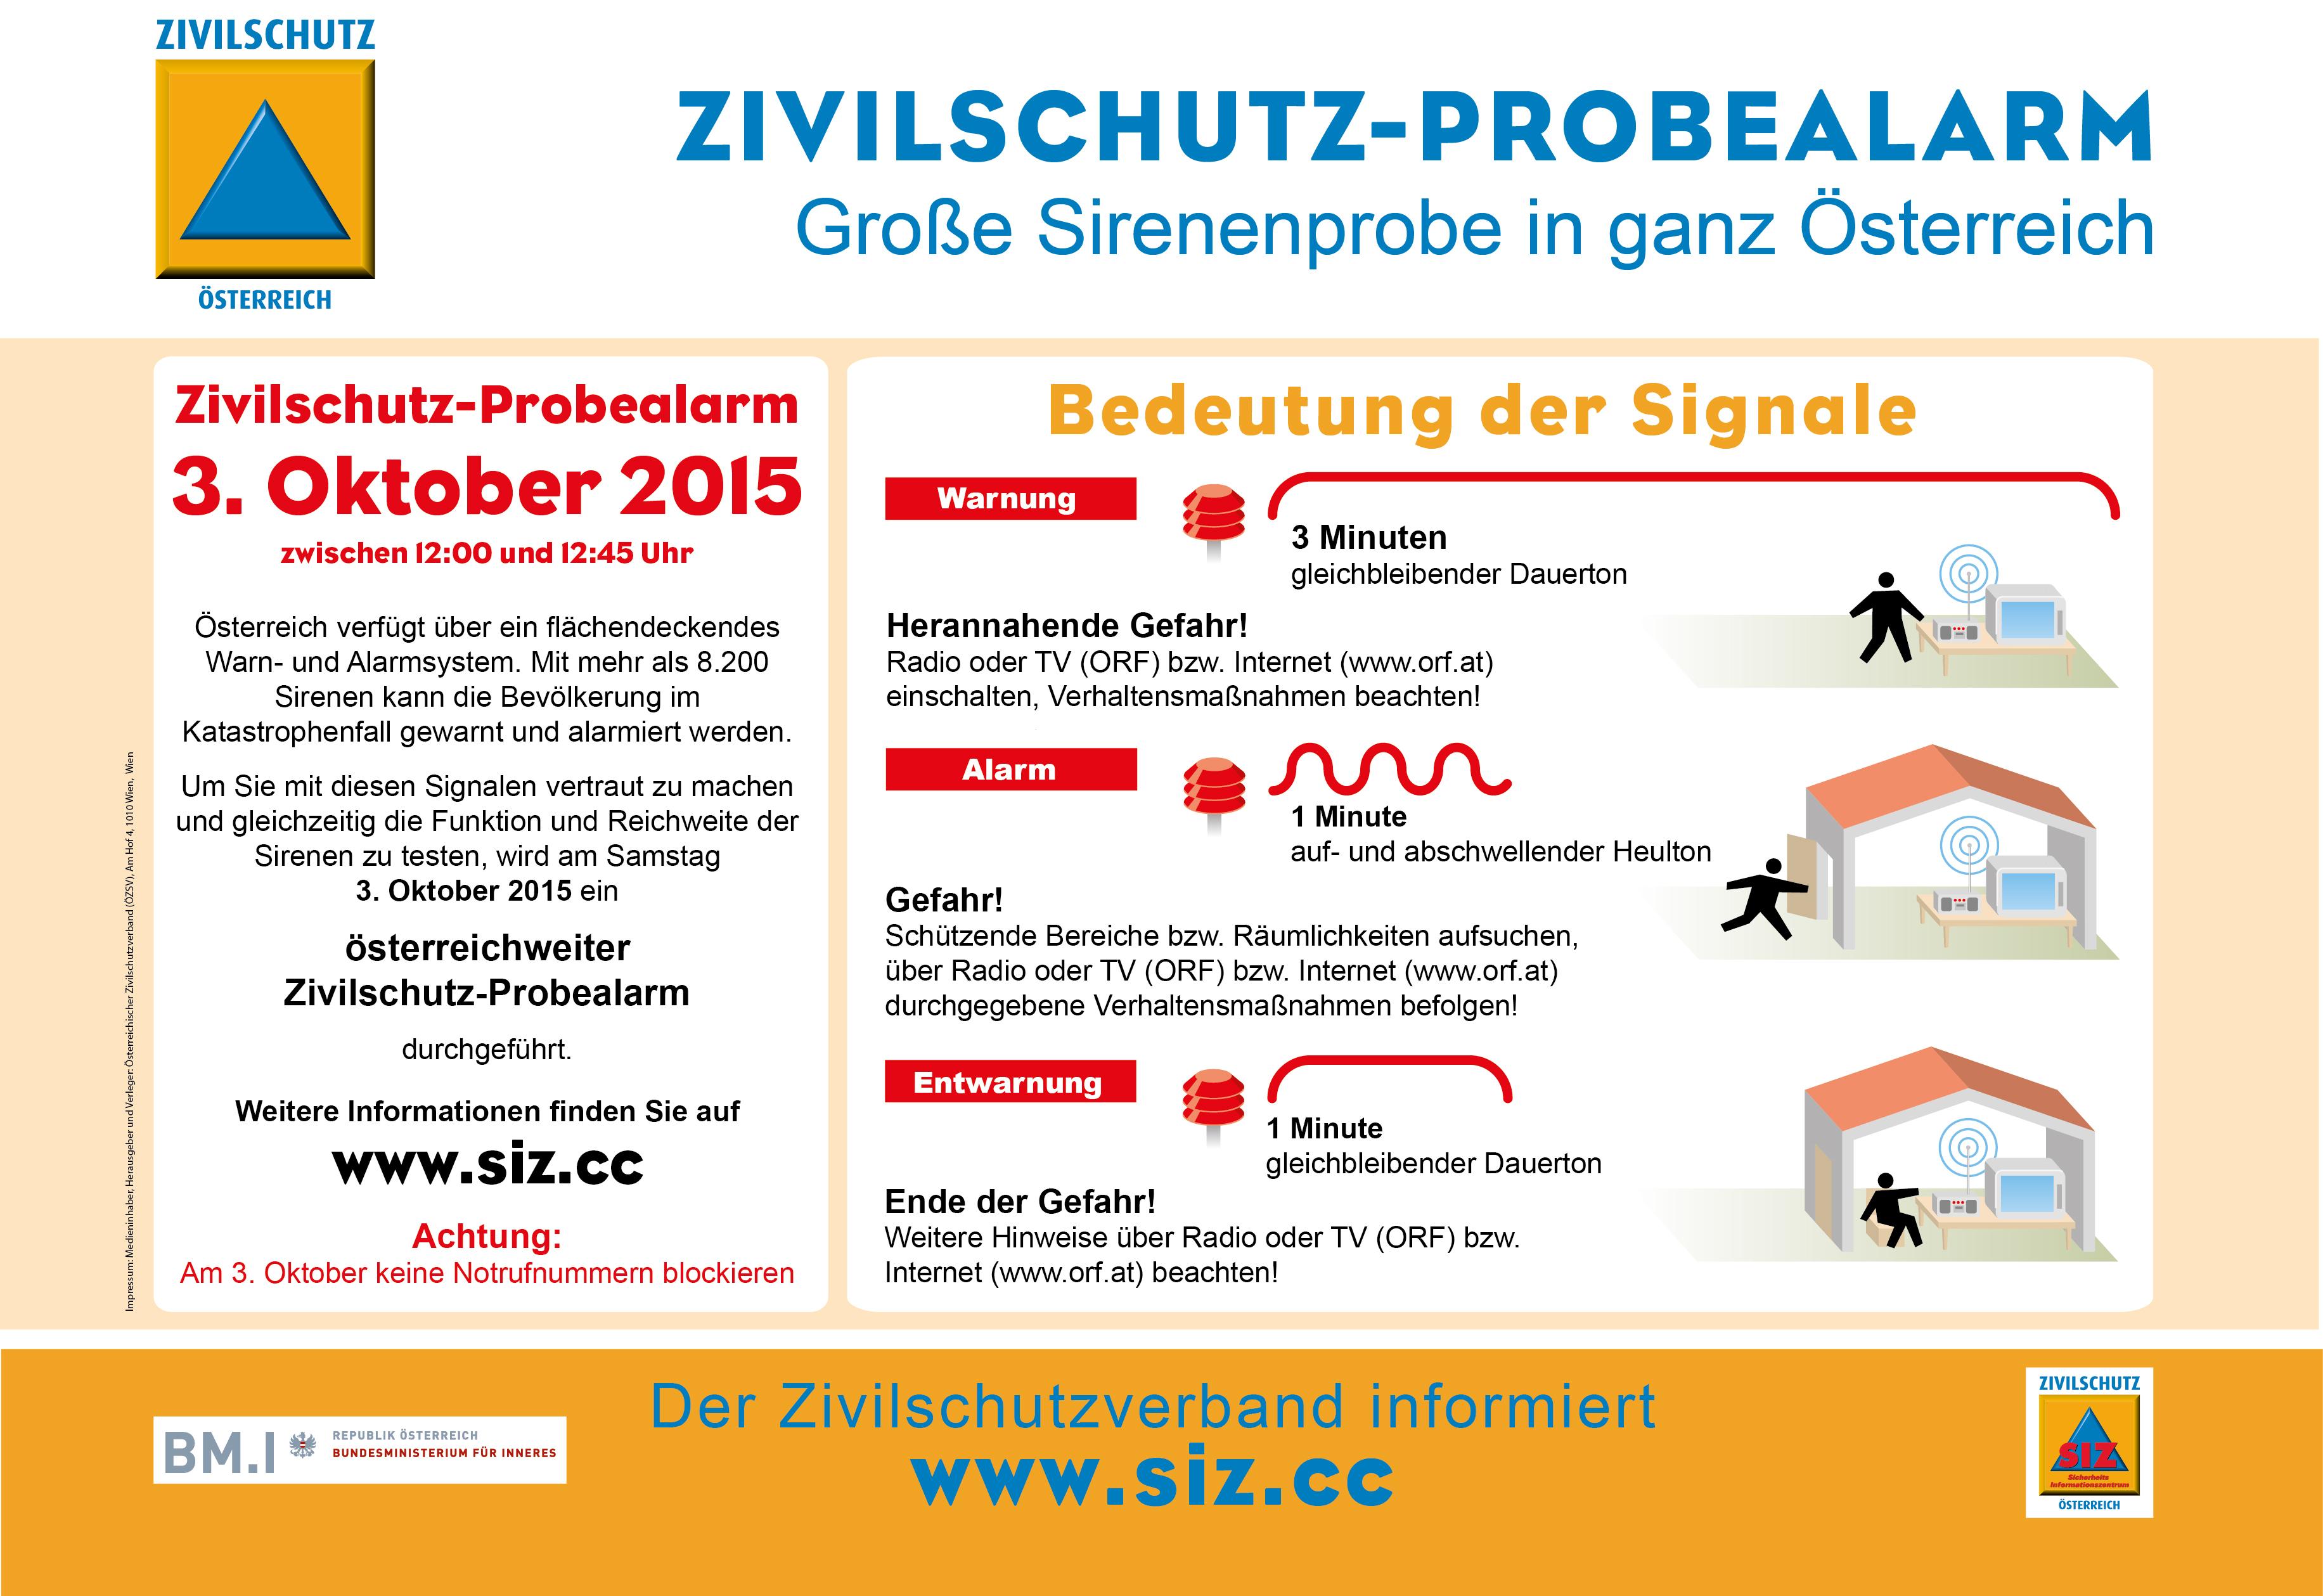 http://www.siz.cc/tools/image.php?image=Zivilschutz_Probealarm_2015_A2.jpg&width=&height=